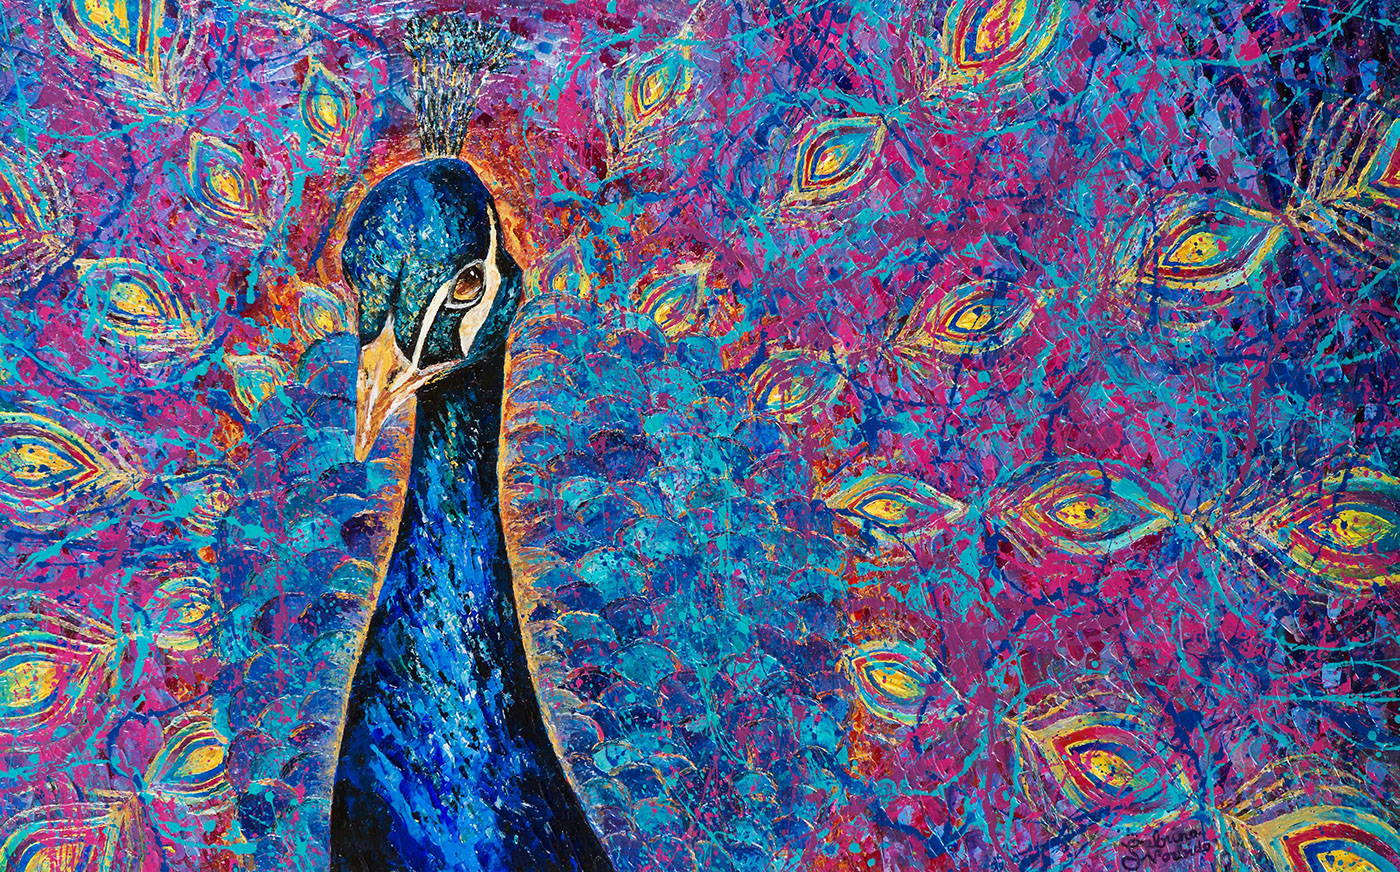 FINEART painting   fineartbrisbane brisbaneartist brisbanepainter peacockpainting behanceartist